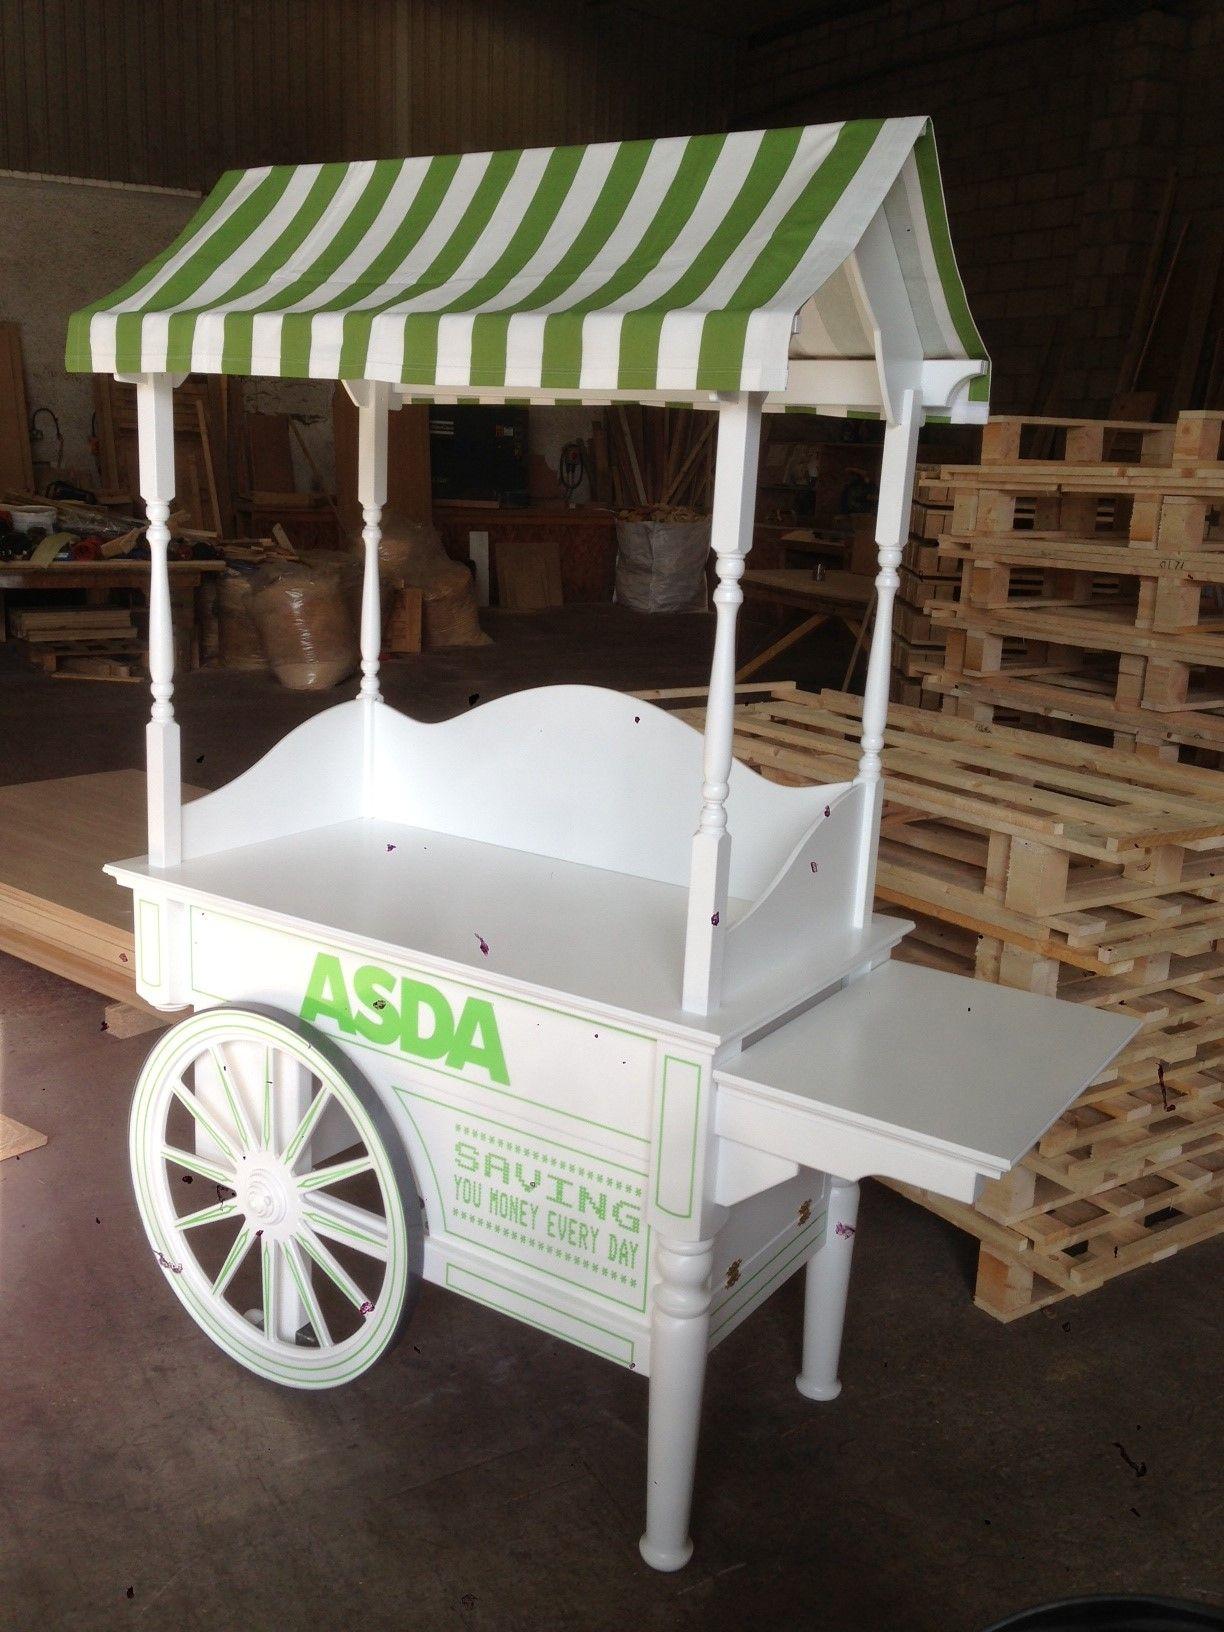 Candy cart บาน ราน อาหาร